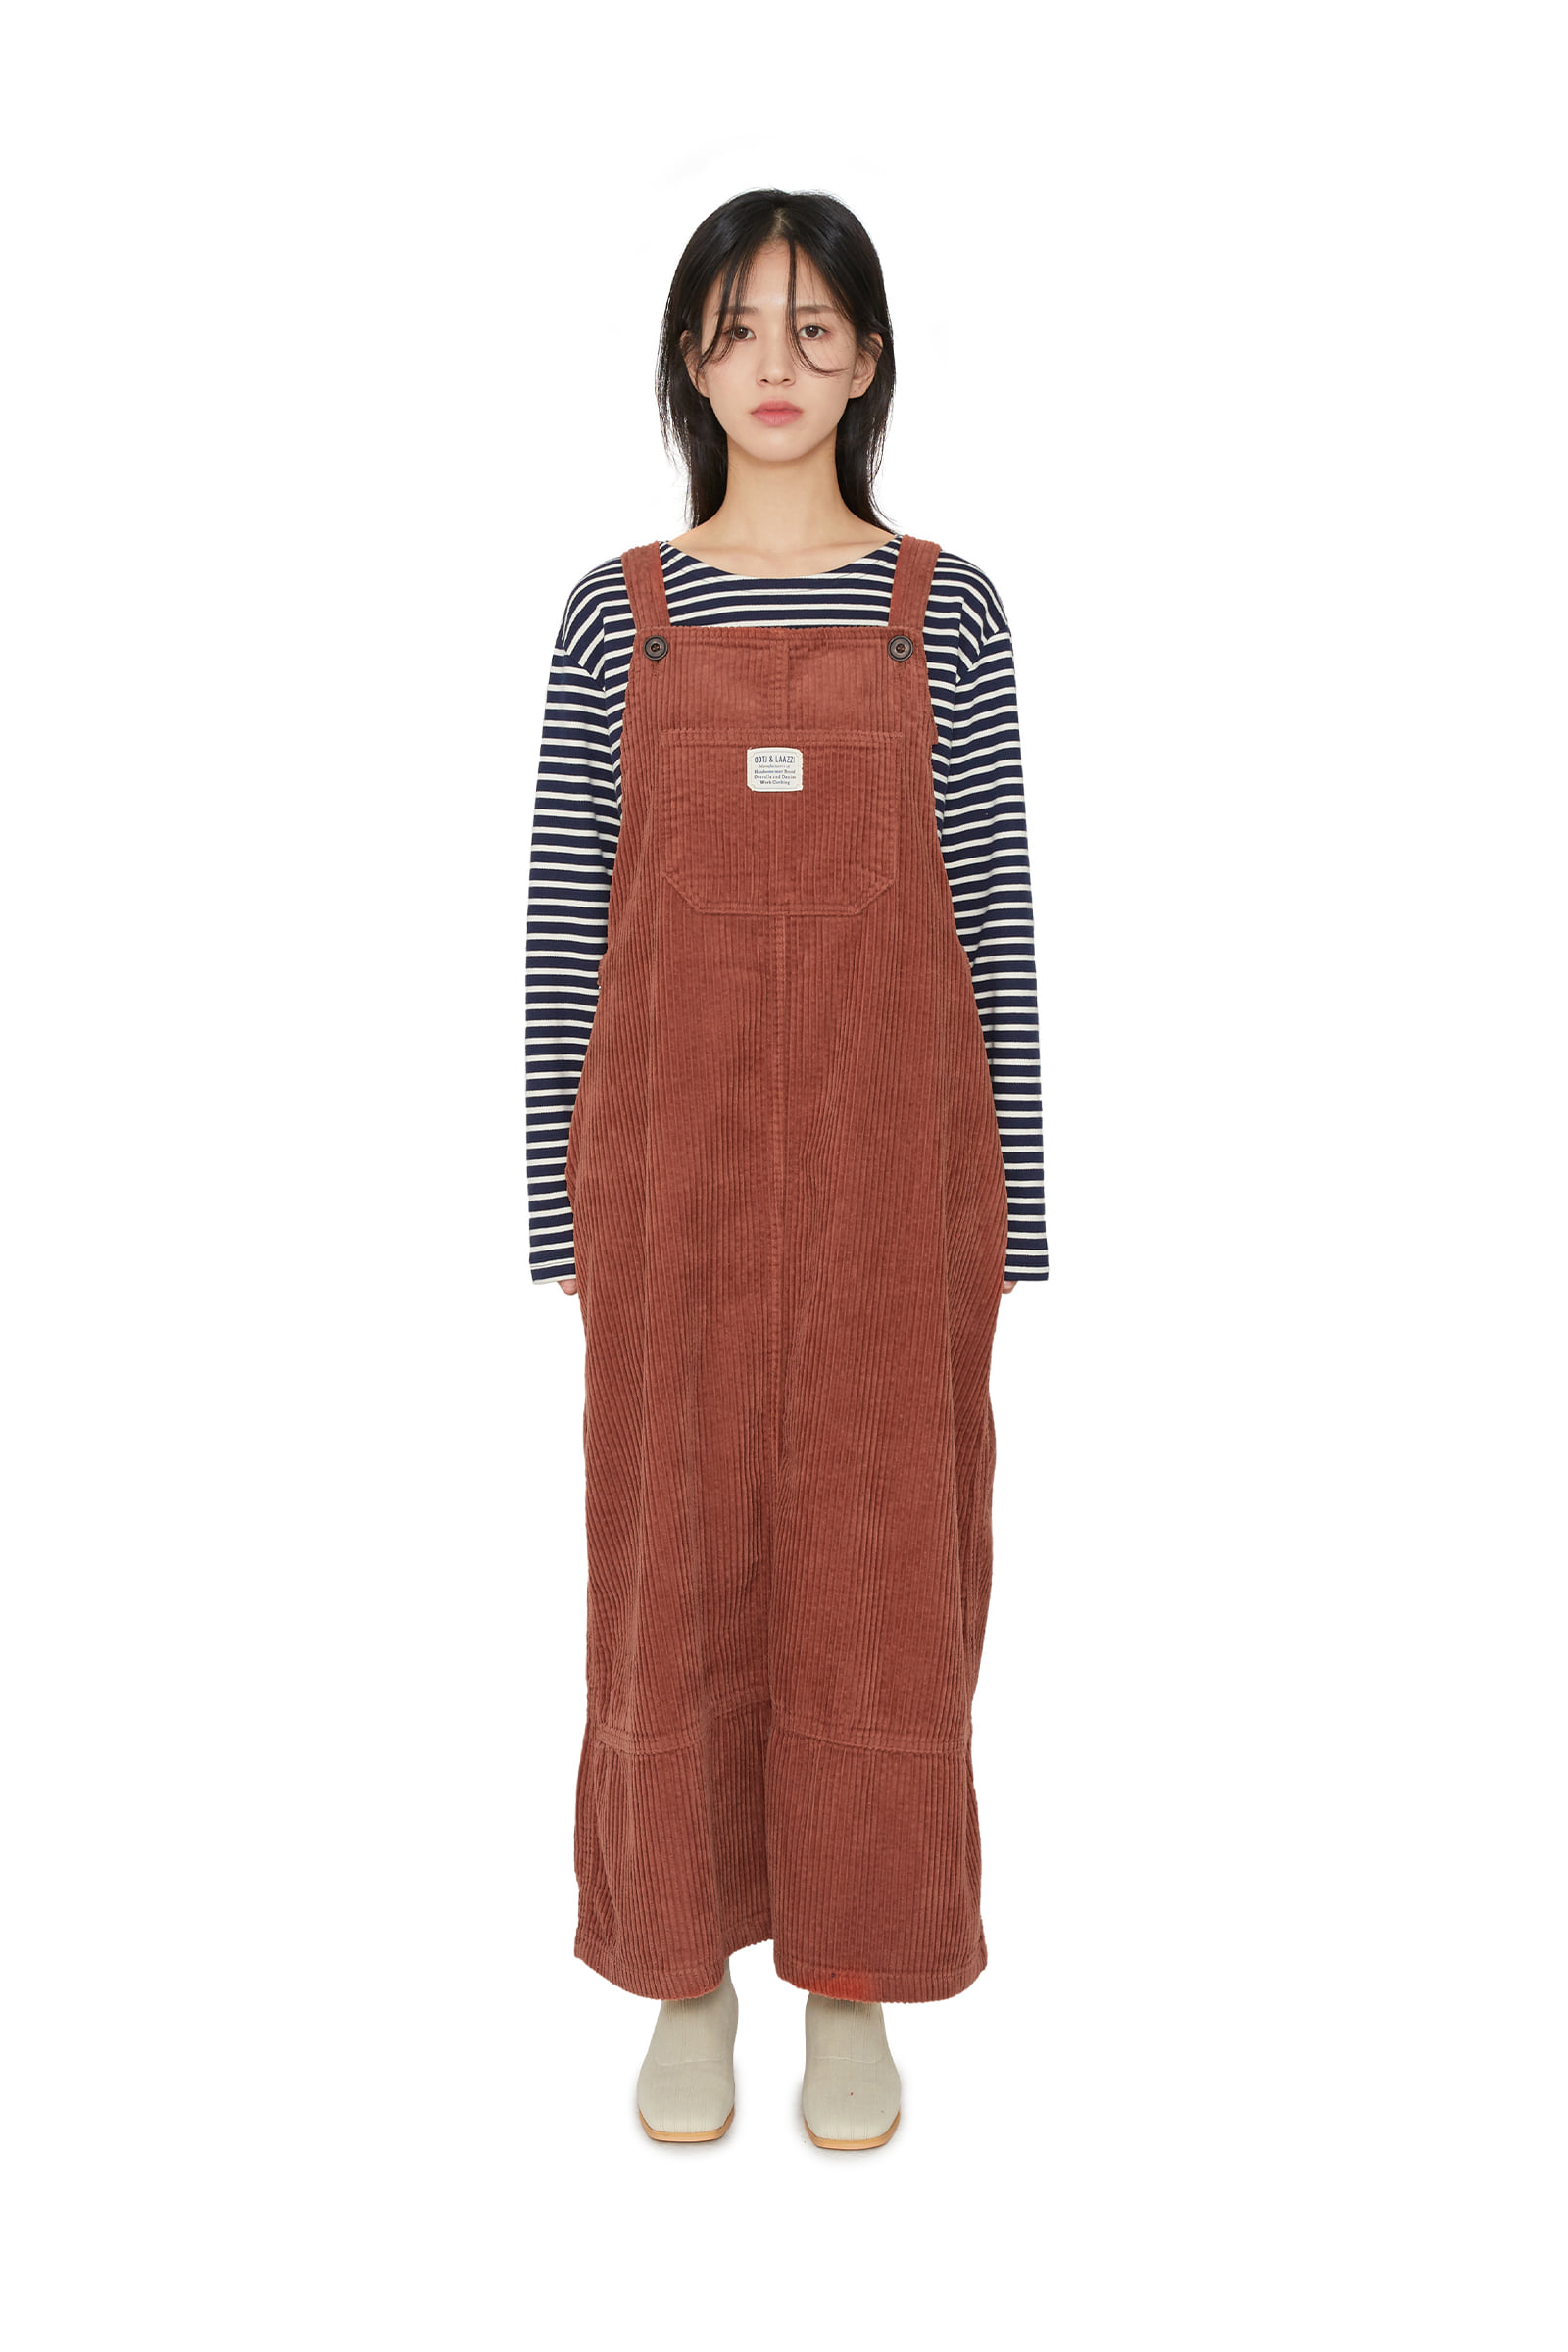 Corduroy overall maxi dress